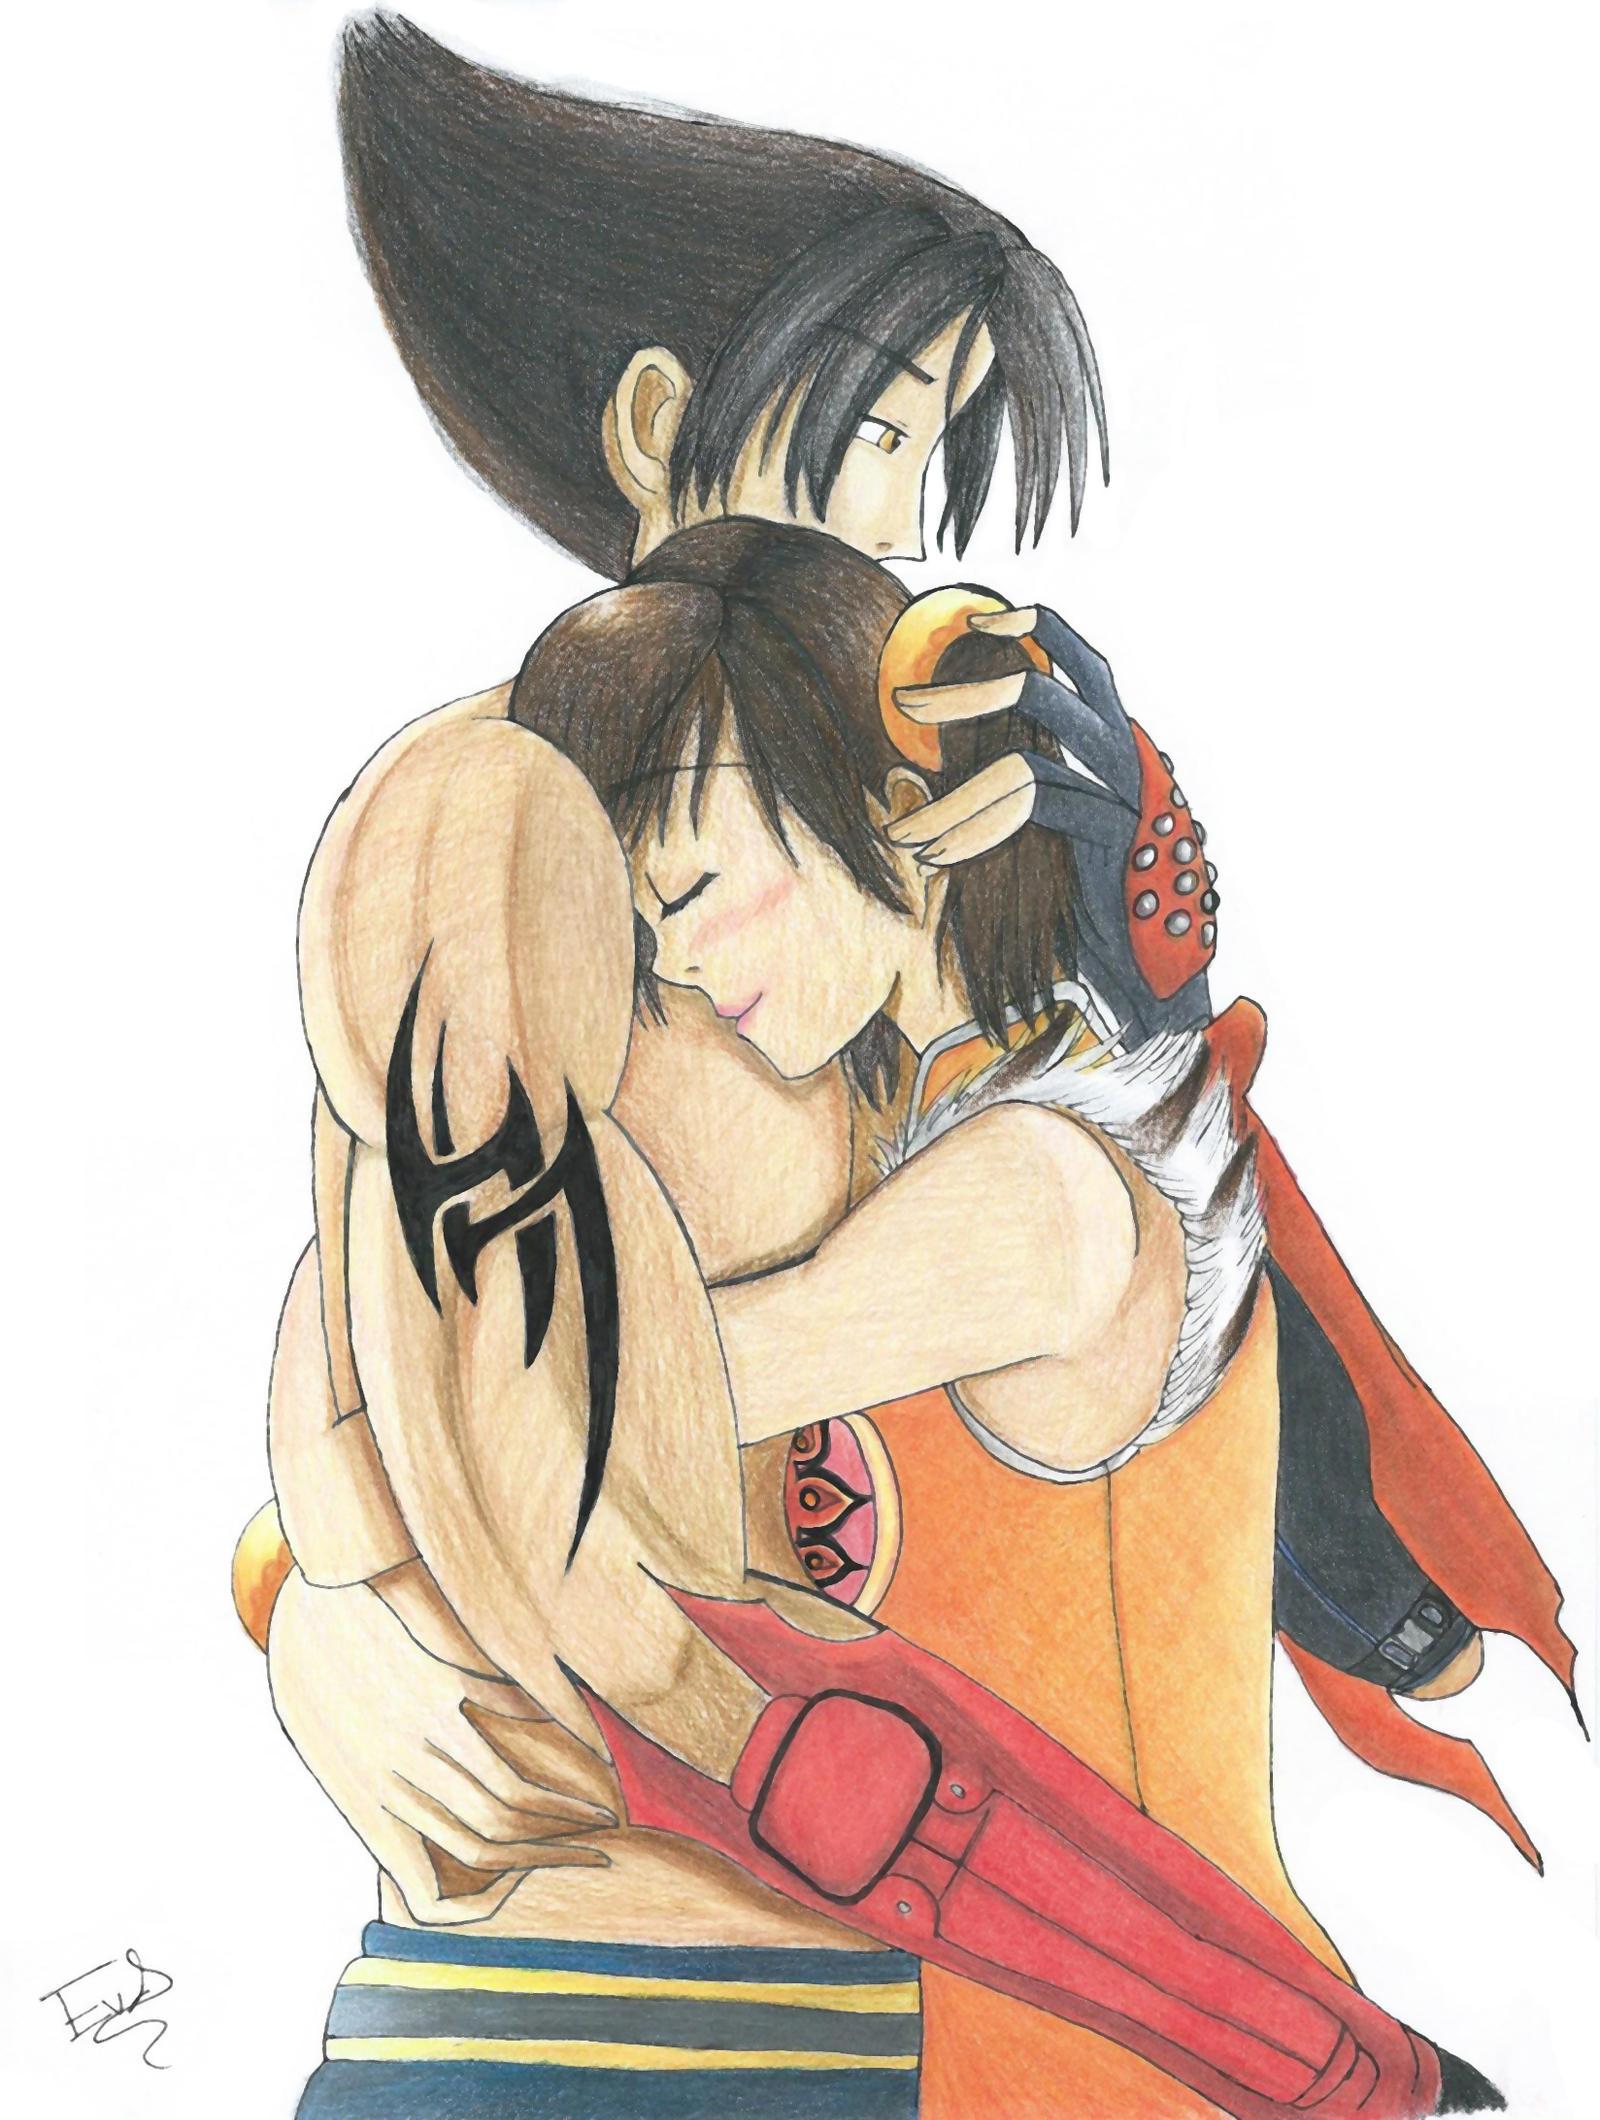 tekken jin and xiaoyu relationship goals